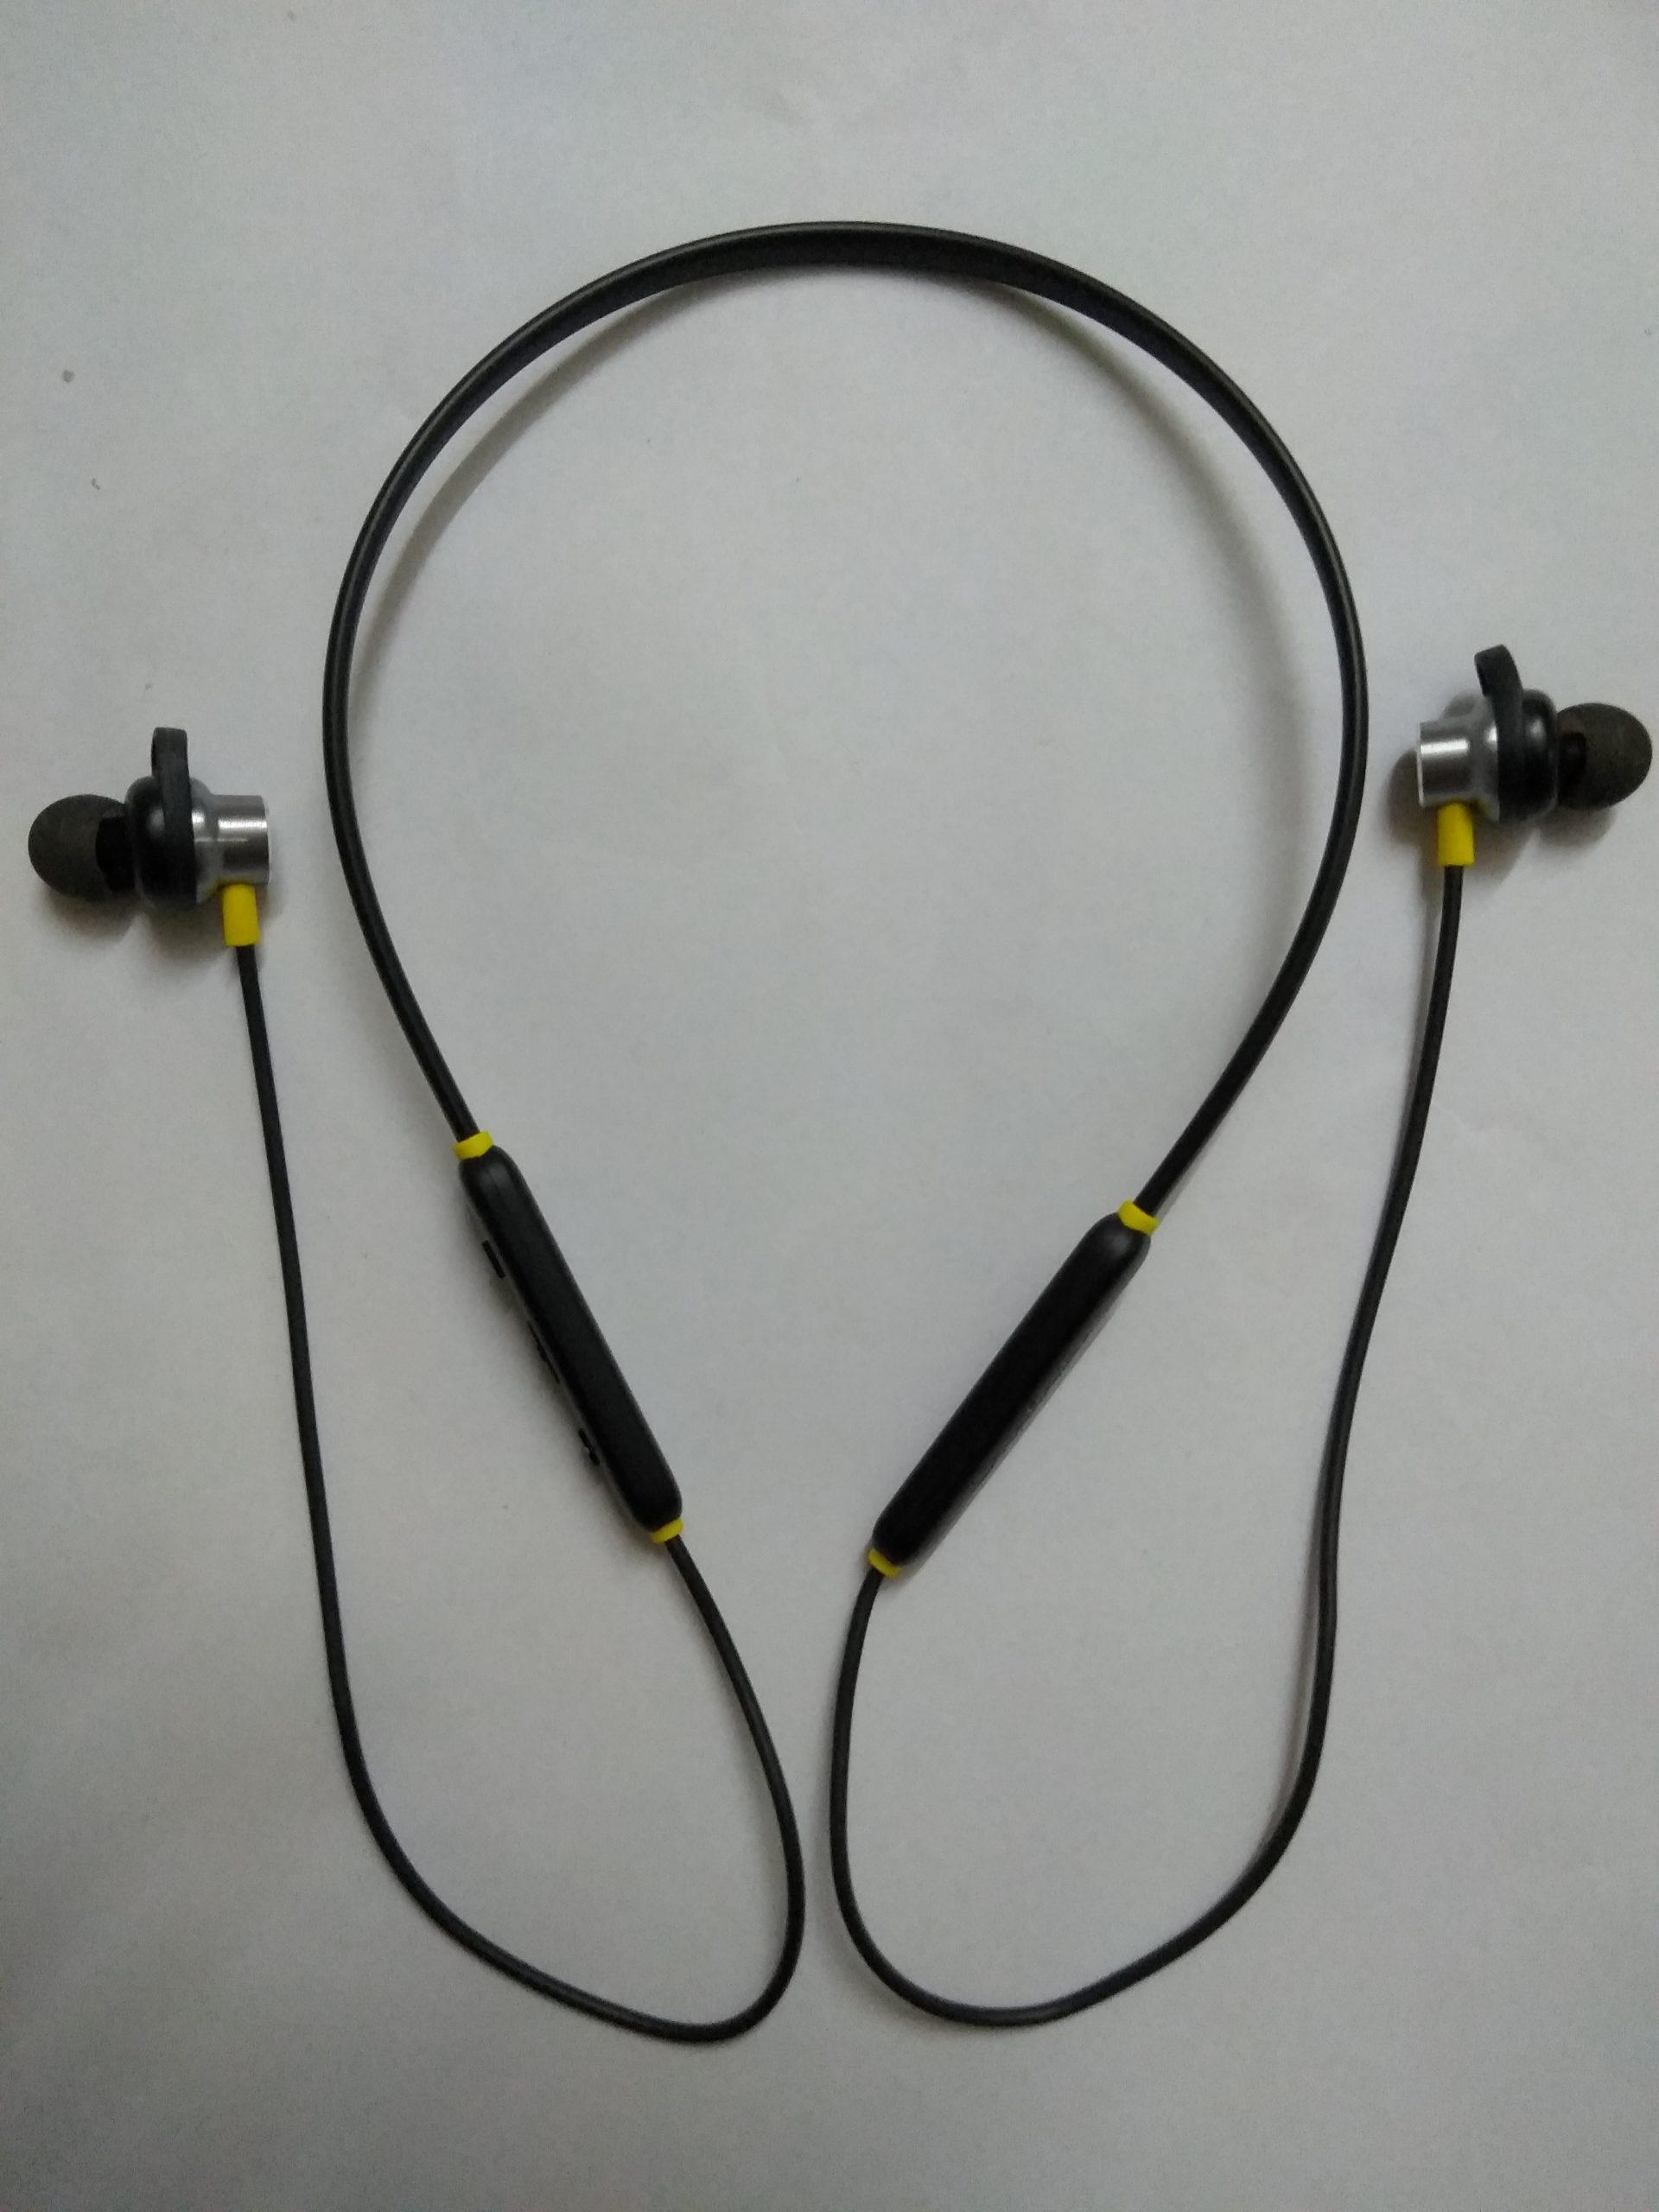 An earphone